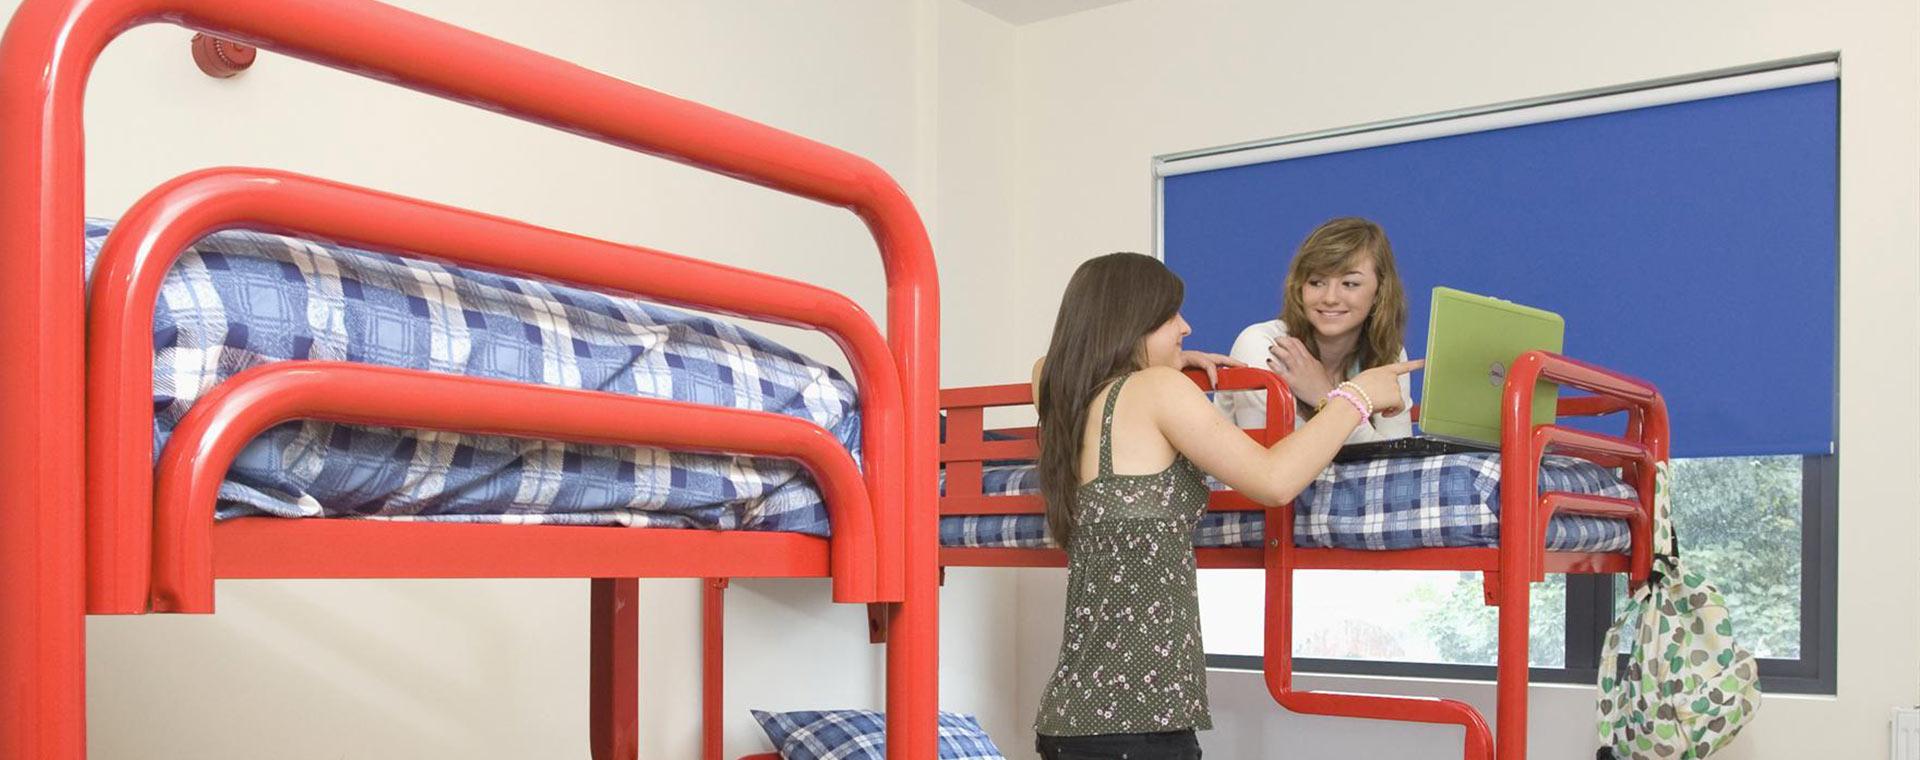 Dorm Hostel Galway